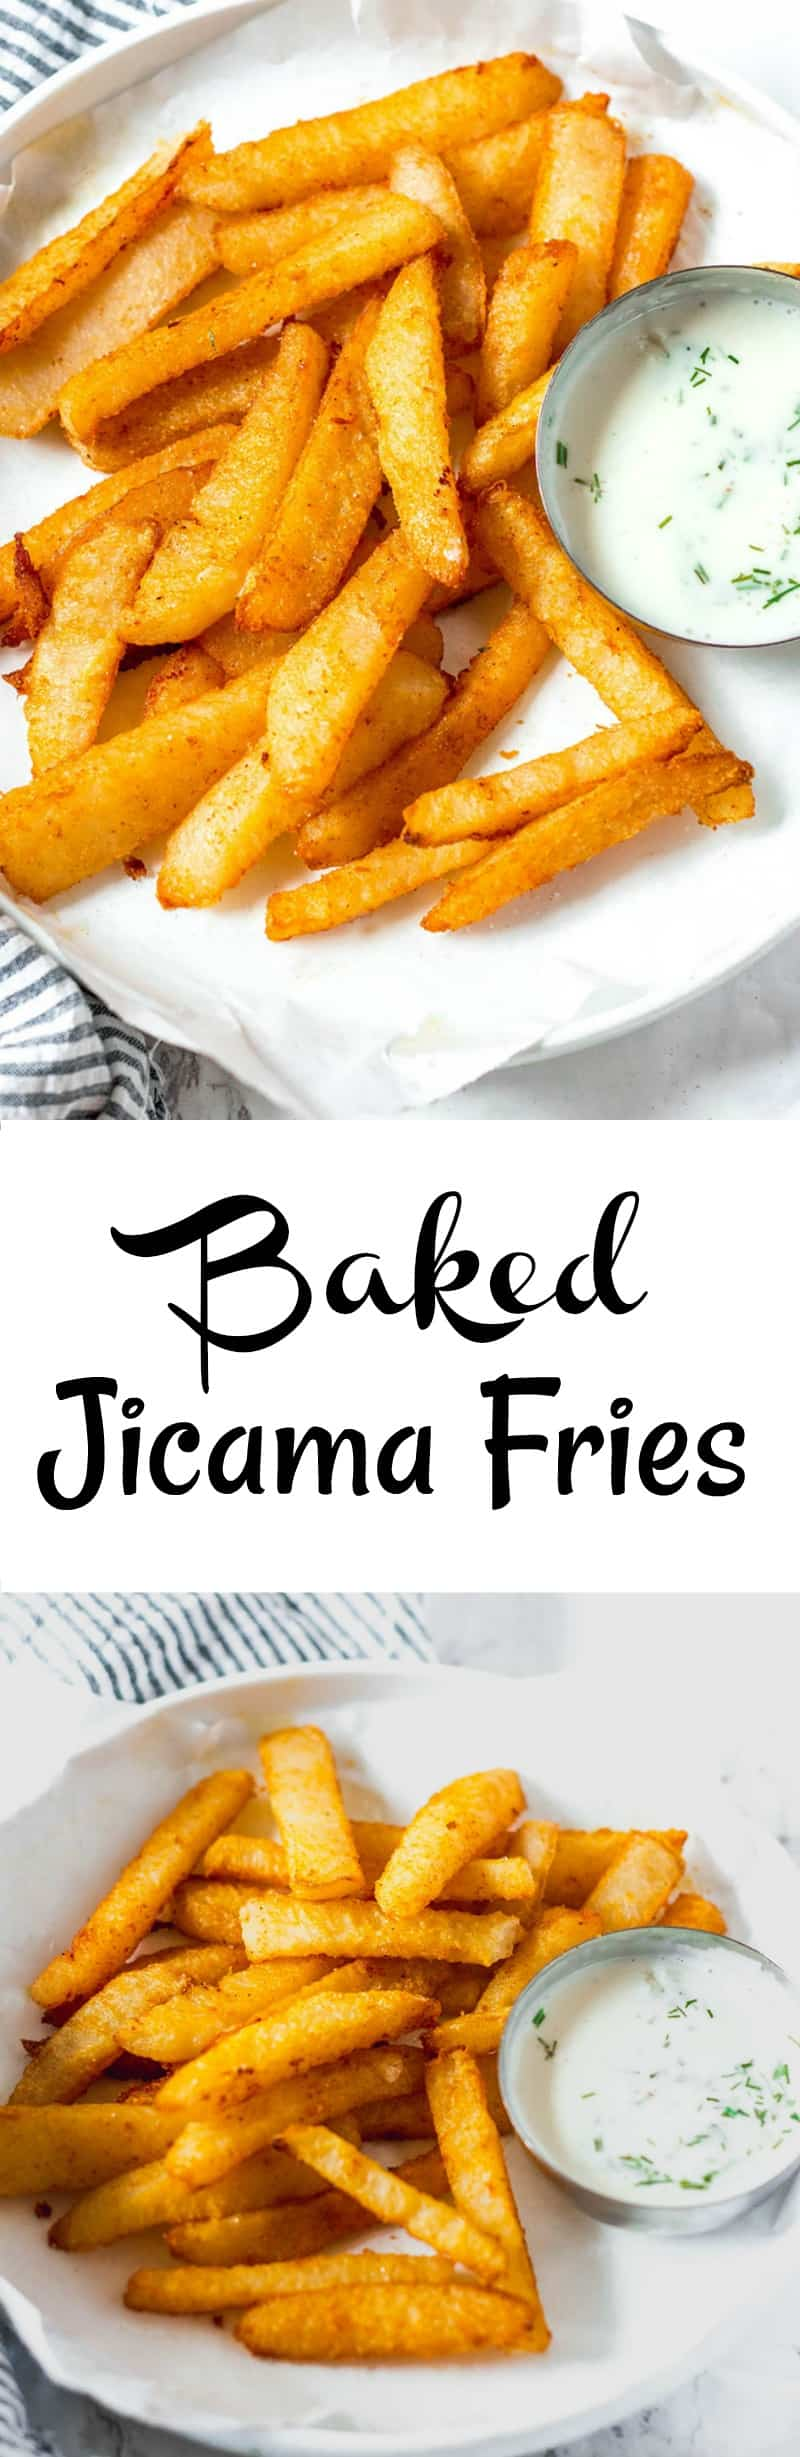 Baked Jicama